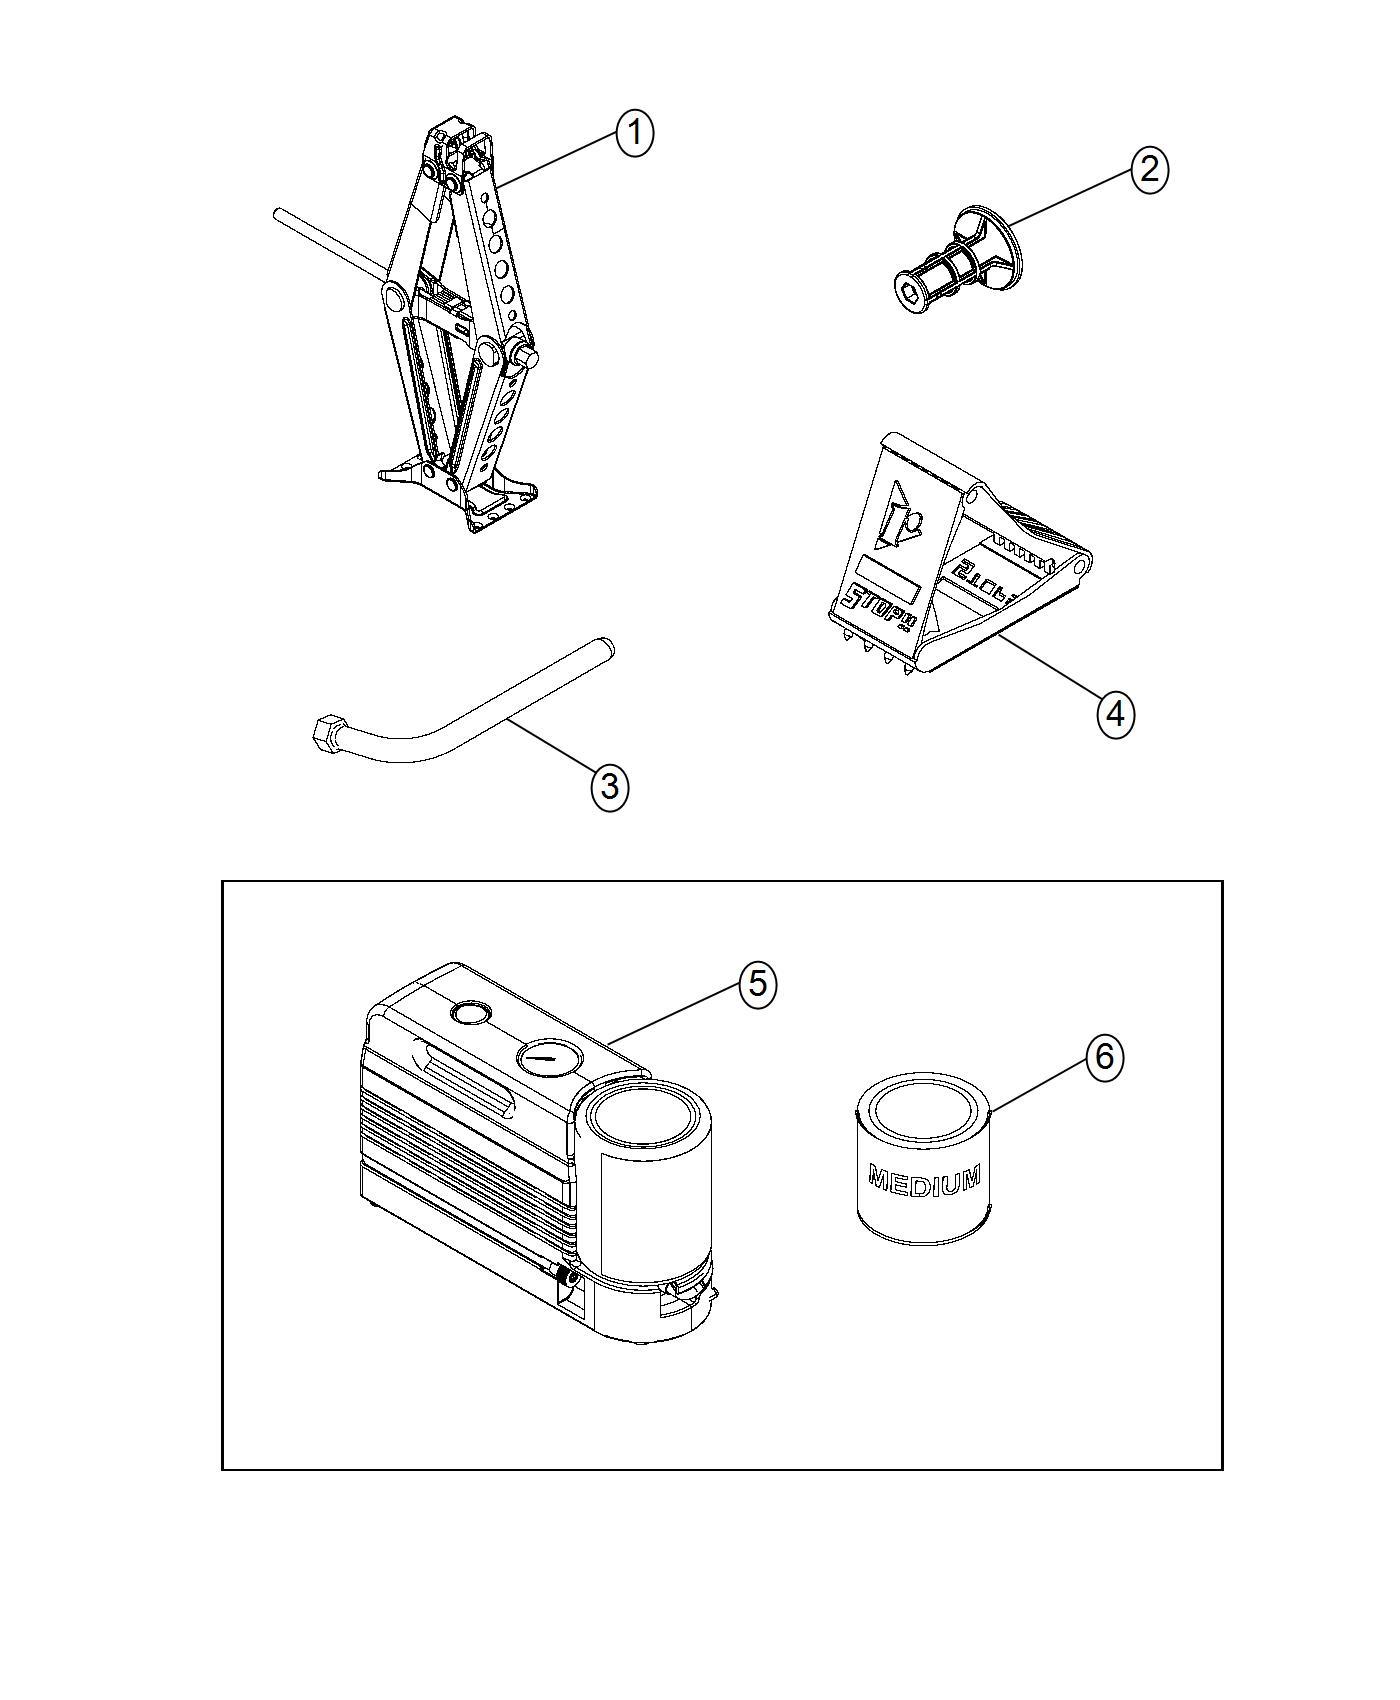 Jeep Renegade Compressor. Tire. [tire service kit], [tire